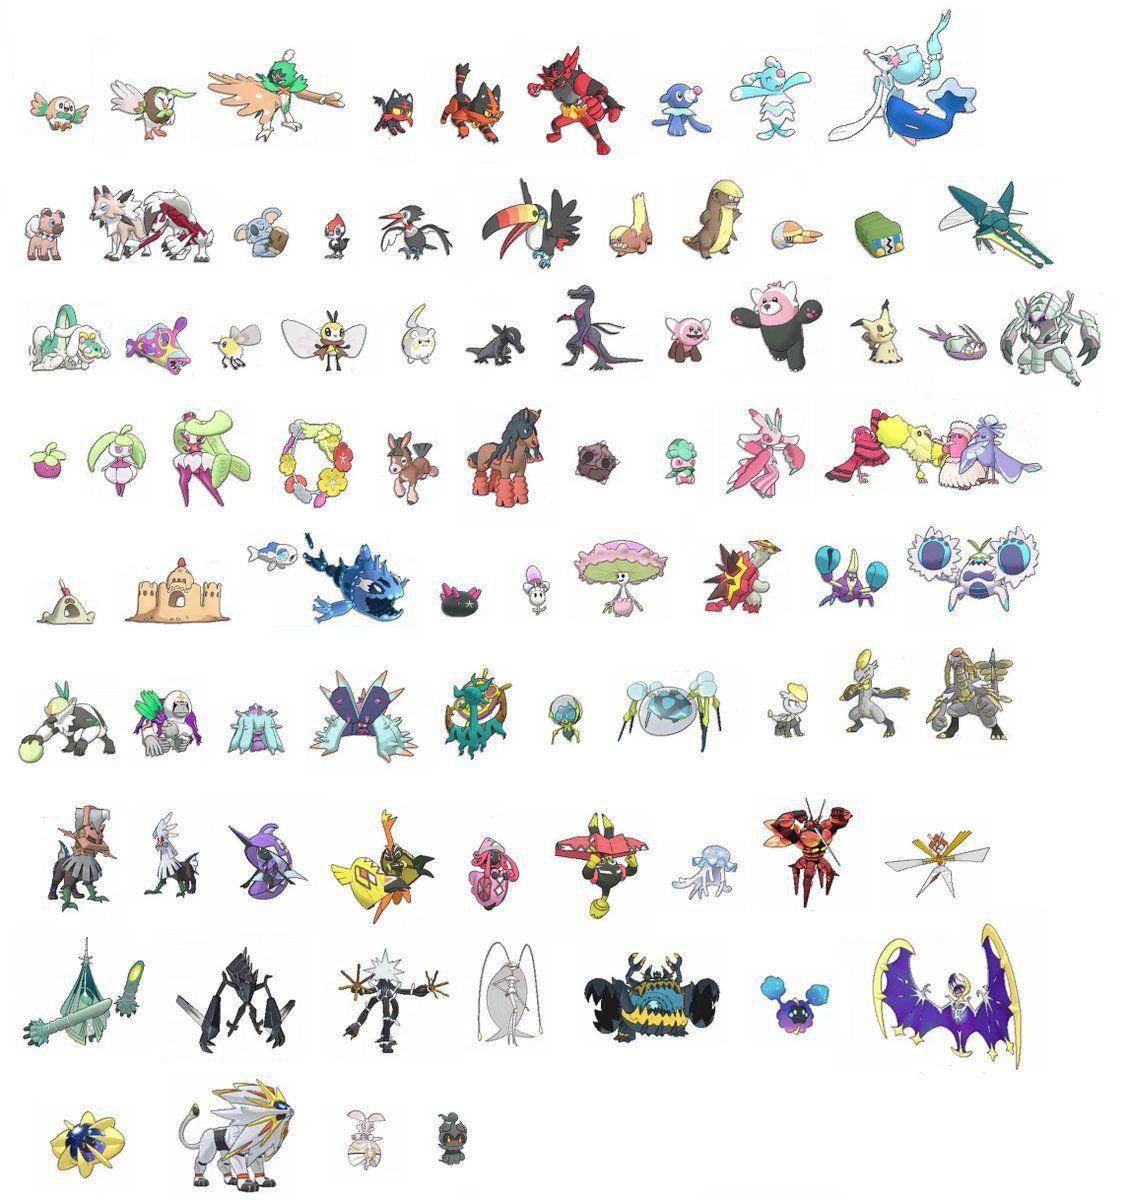 257653f858275254fbc5da2b0d973b0f - How To Get Pokeballs In Pokemon Sun And Moon Demo